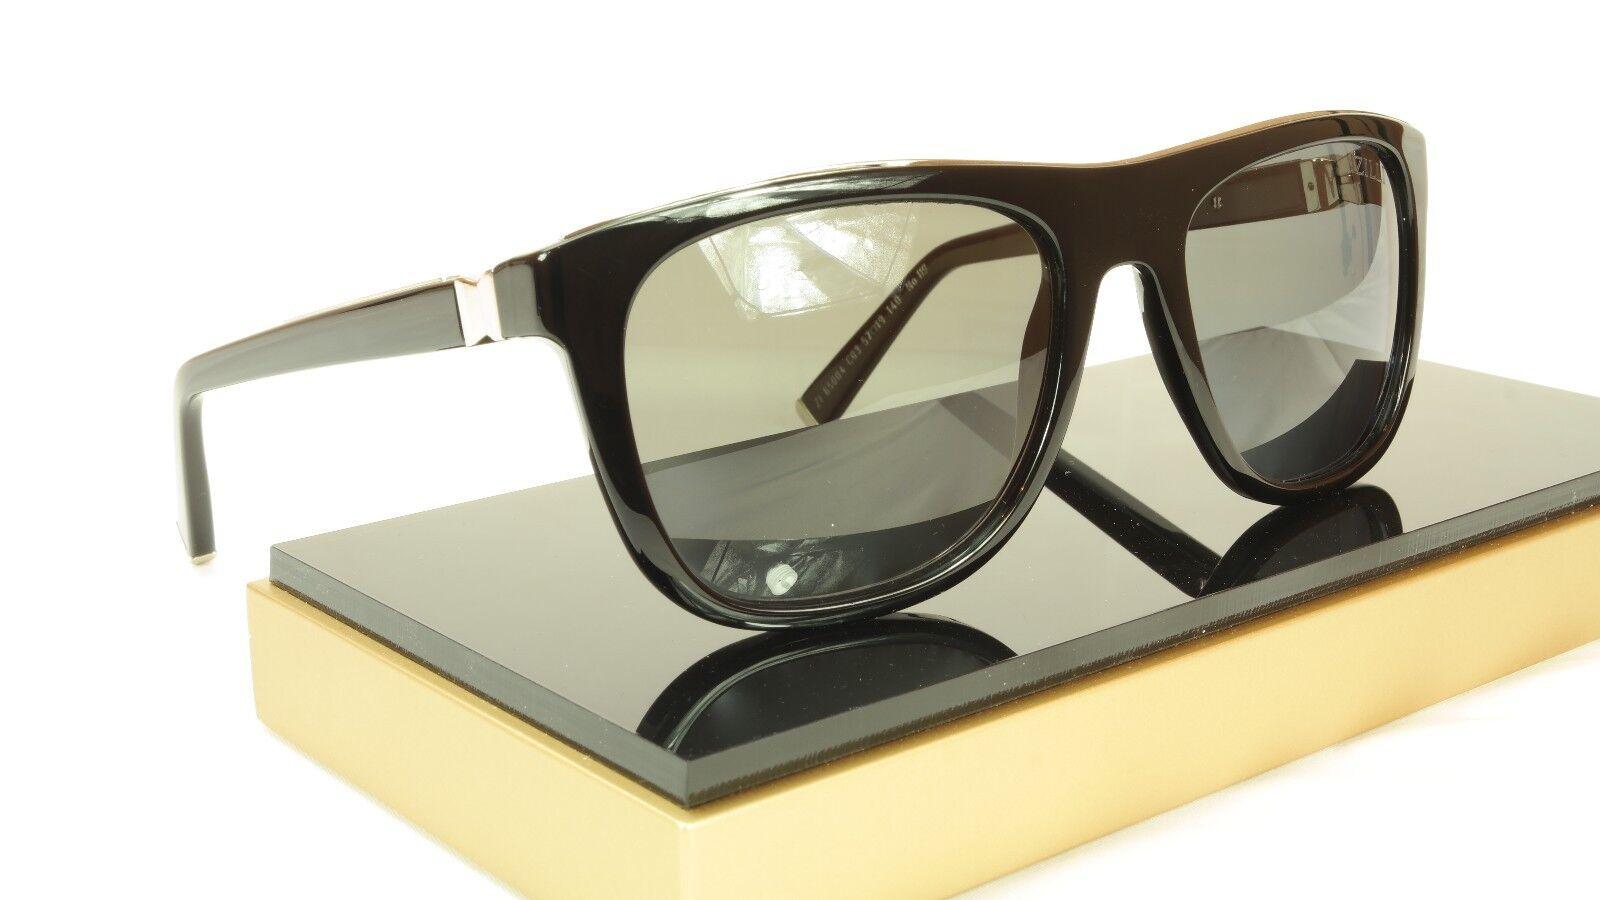 7873b103fe9 ... ZILLI Sunglasses Polarized Black Hand Made Acetate Titanium France ZI  65004 C03 фото ...